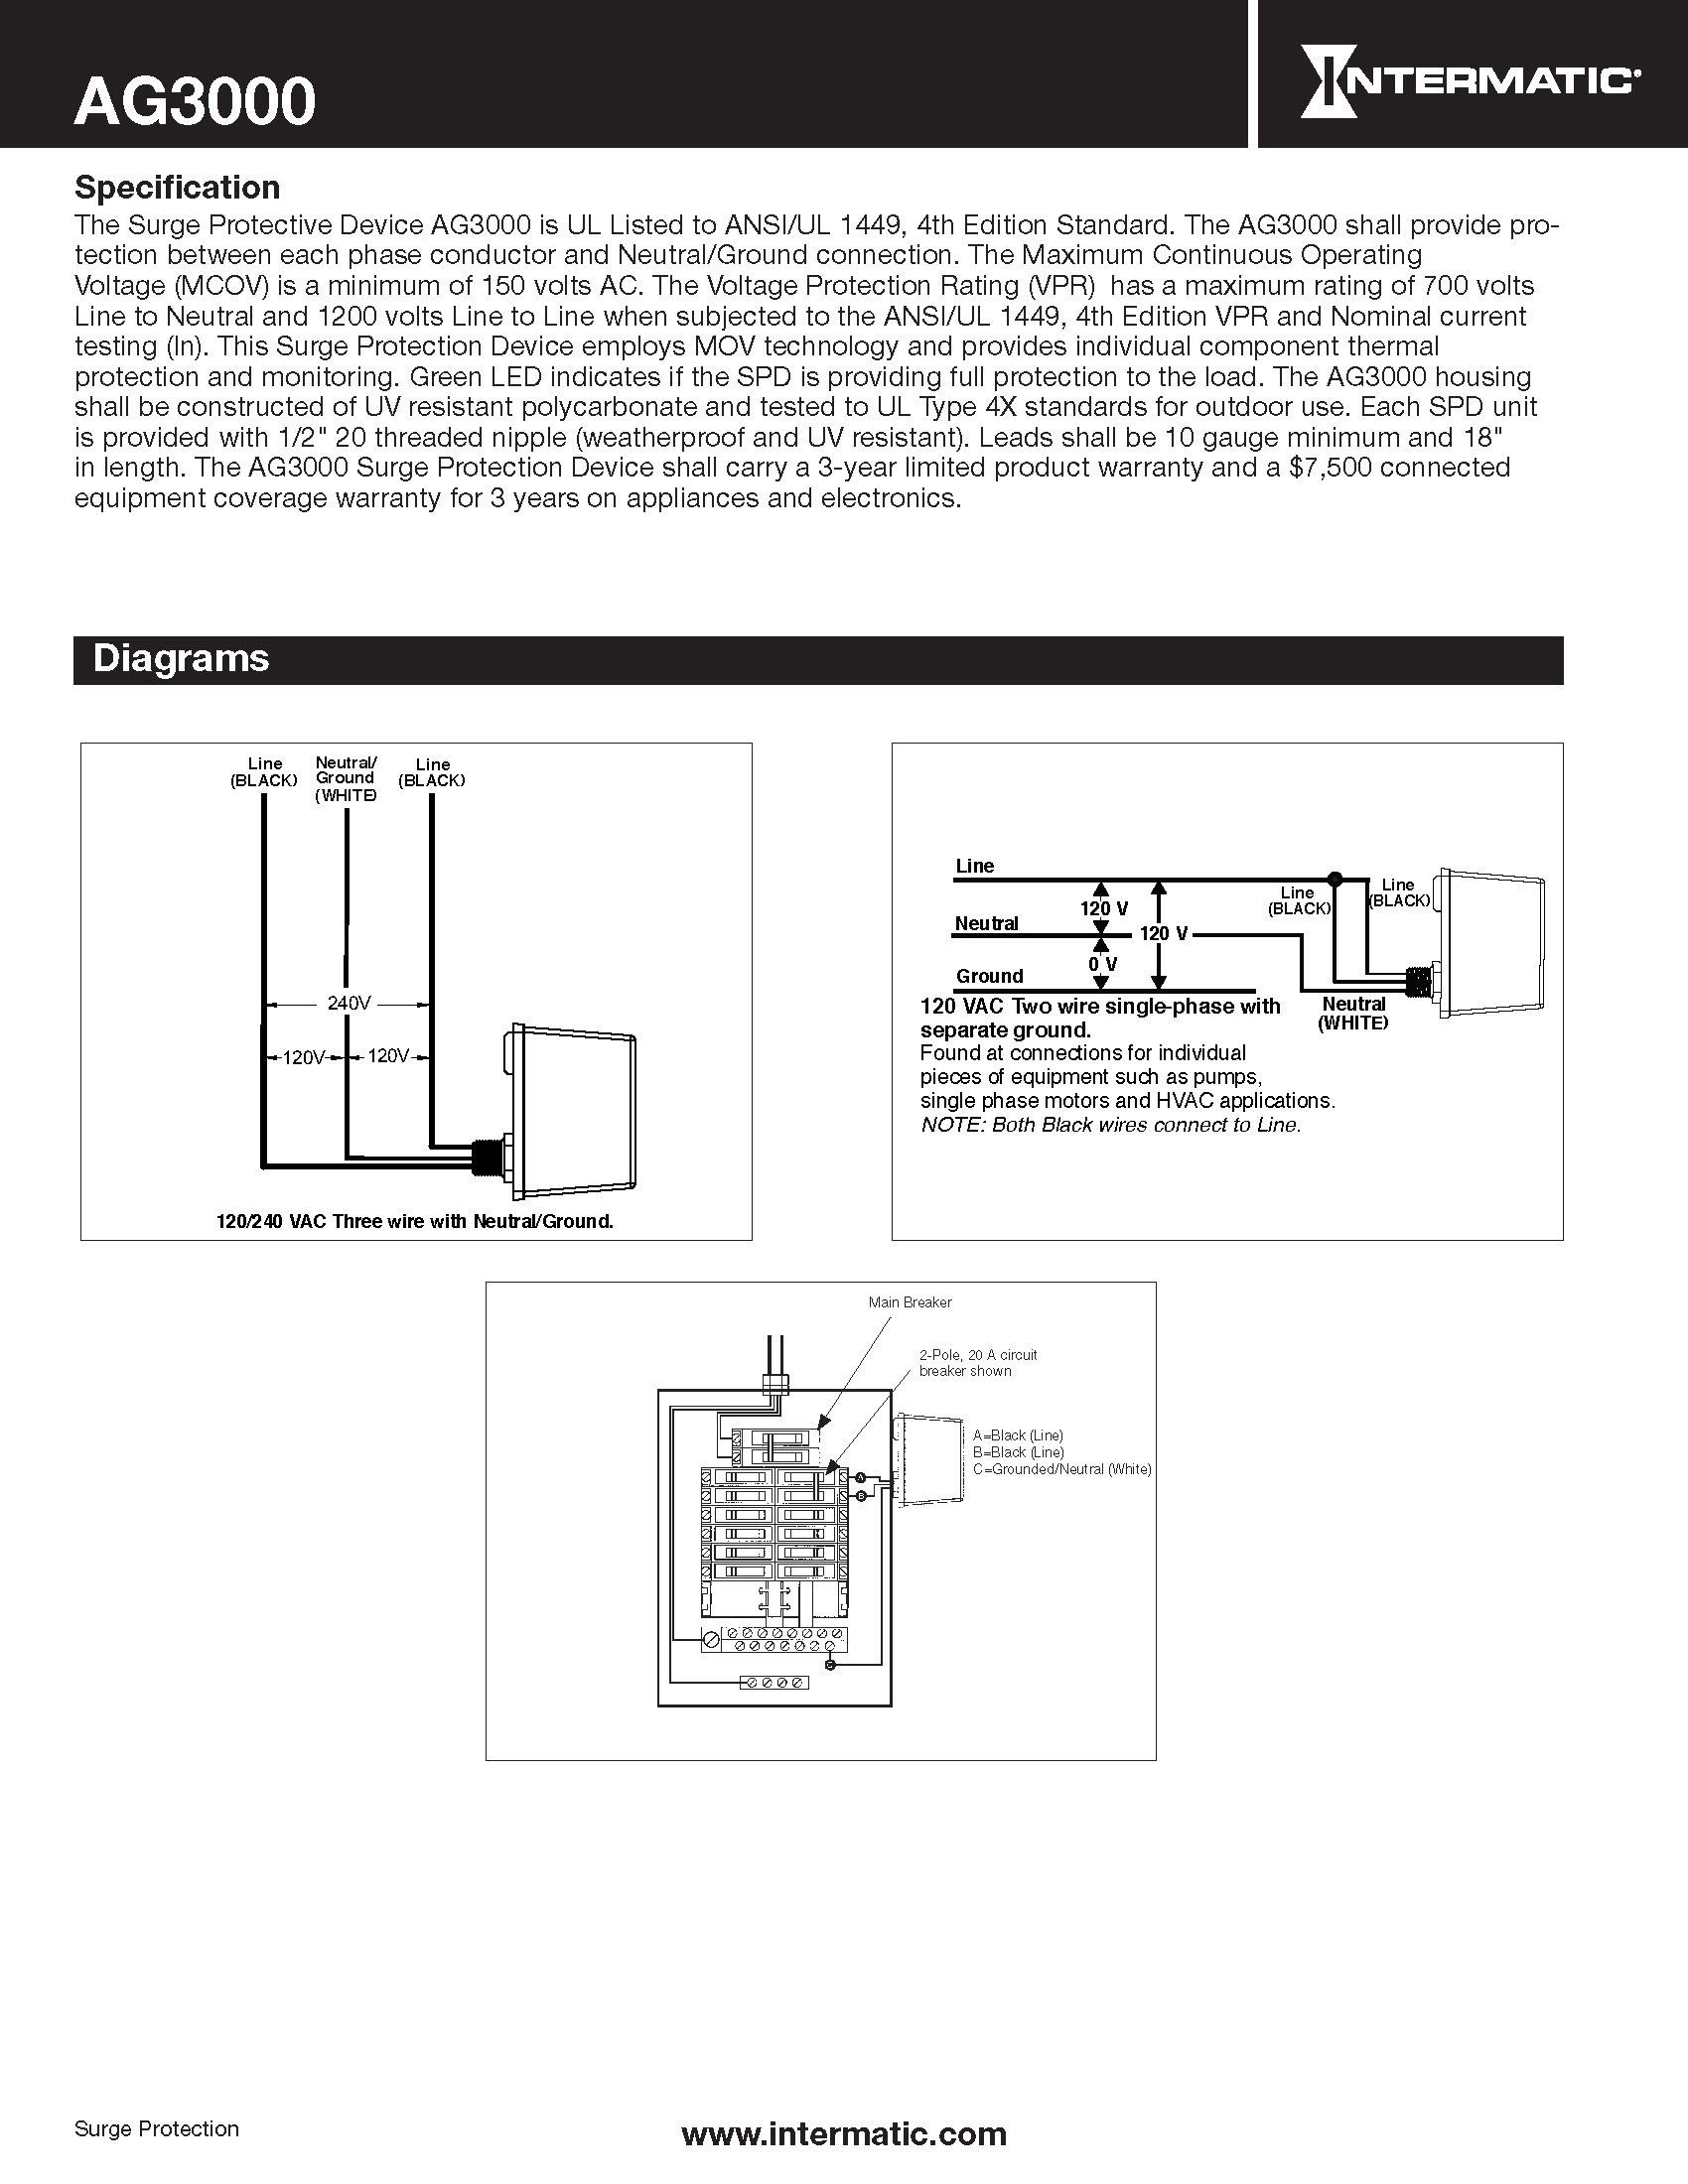 Intermatic AG3000 120/240 VAC Universal HVAC Surge Protective Device, Color